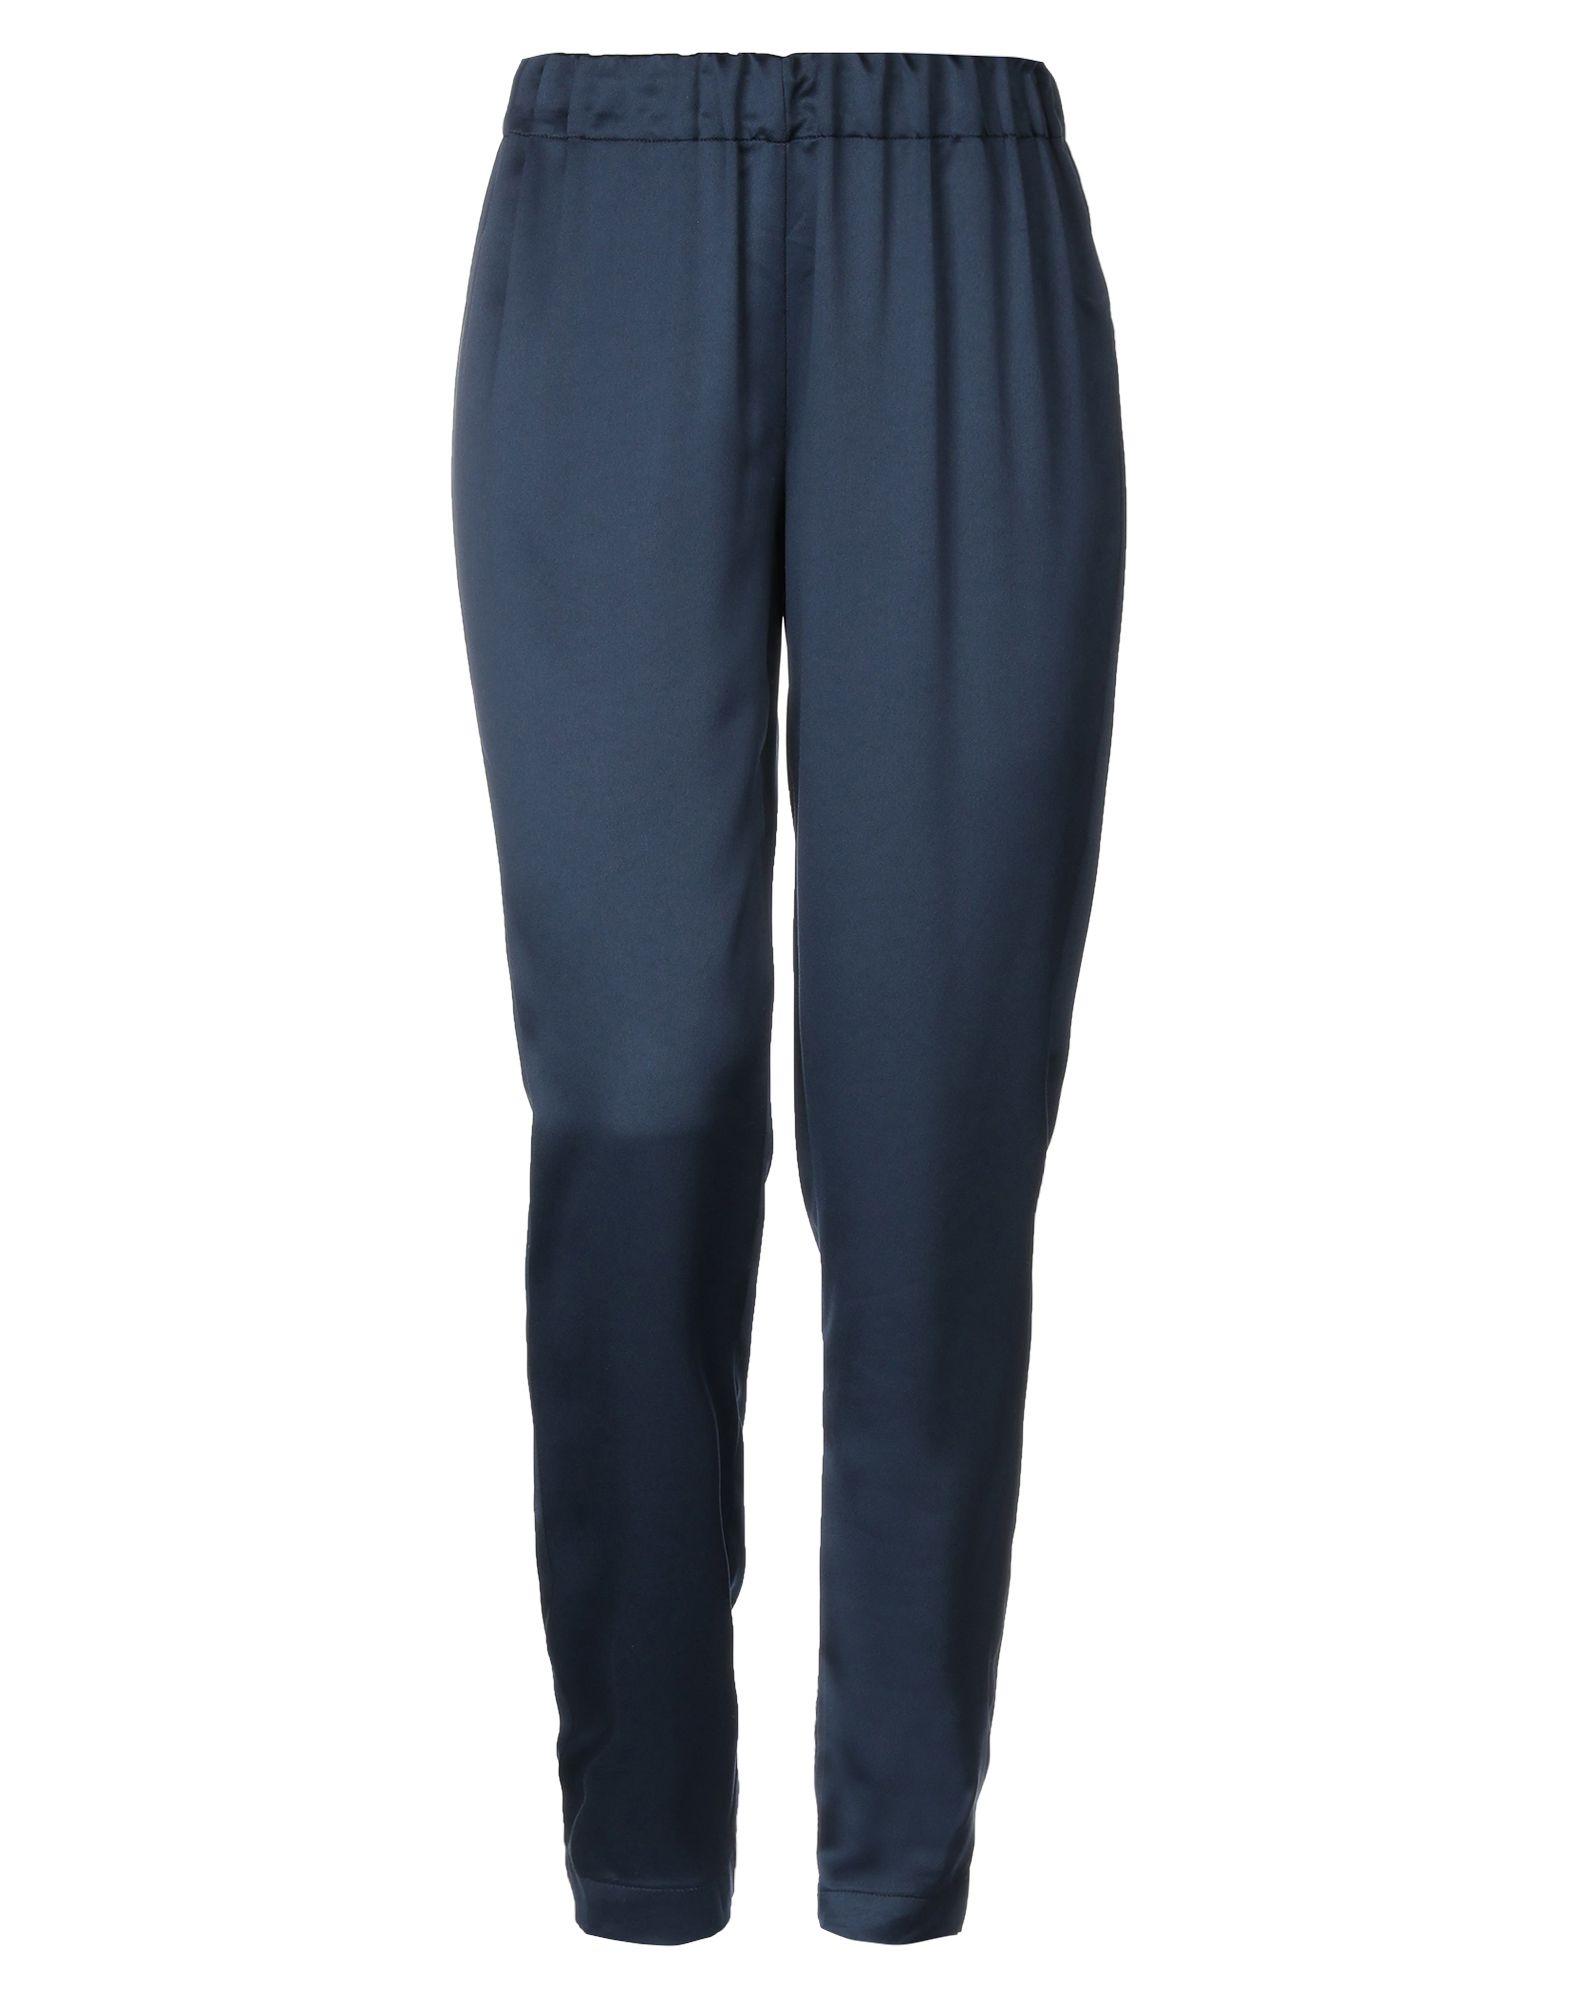 TRUSSARDI JEANS Повседневные брюки trousers trussardi collection брюки с карманами